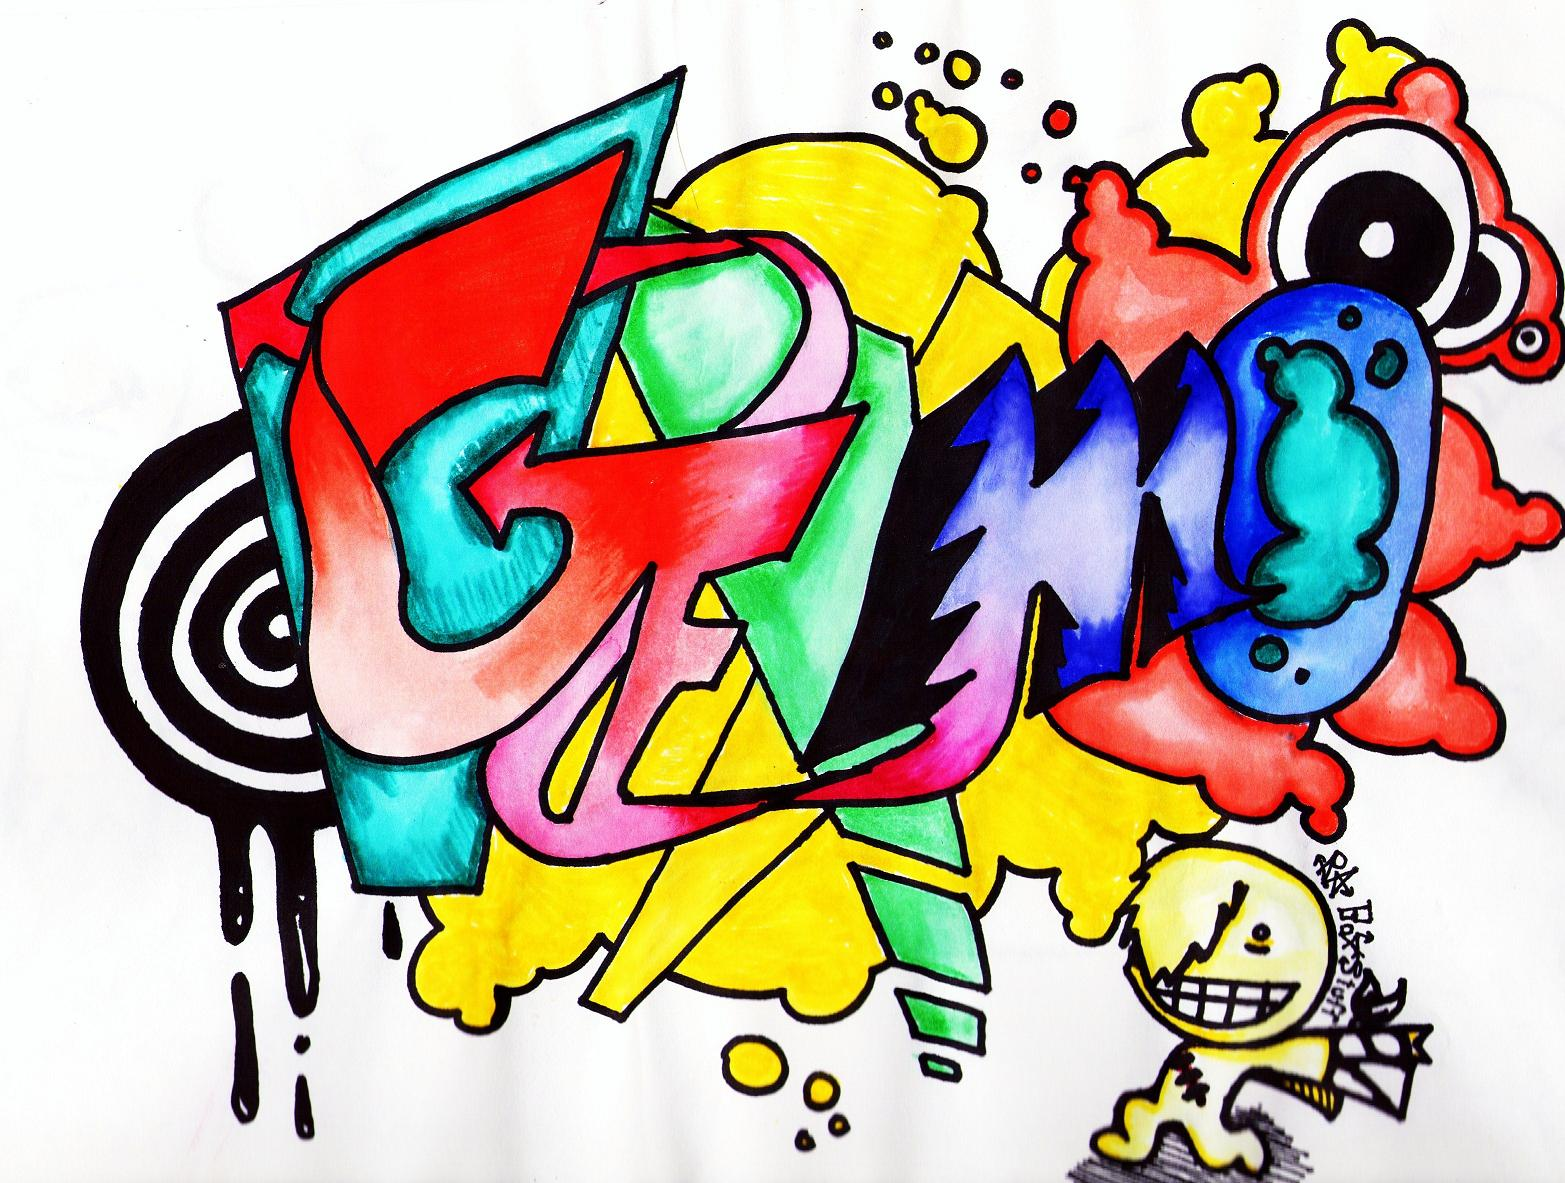 Gemo (Gee Mo)